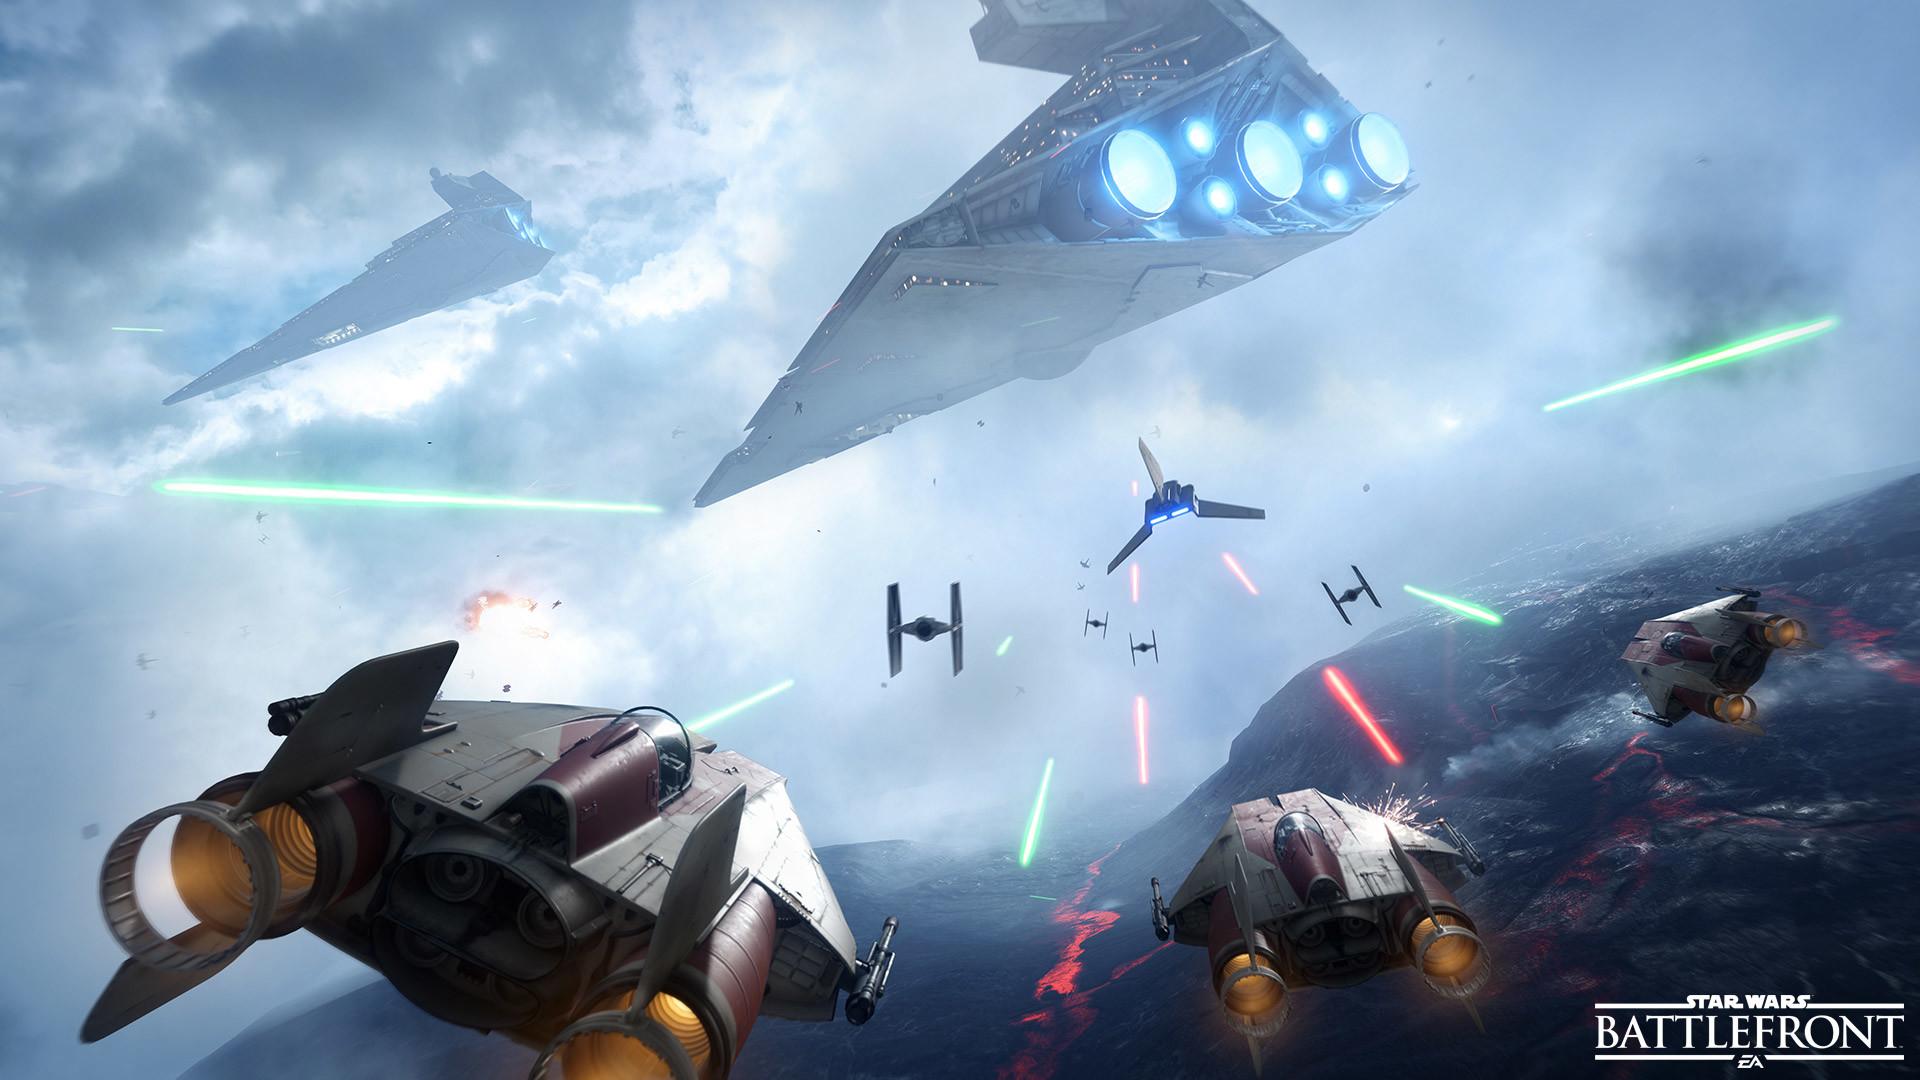 Star Wars Battlefront Gamescom Wallpapers